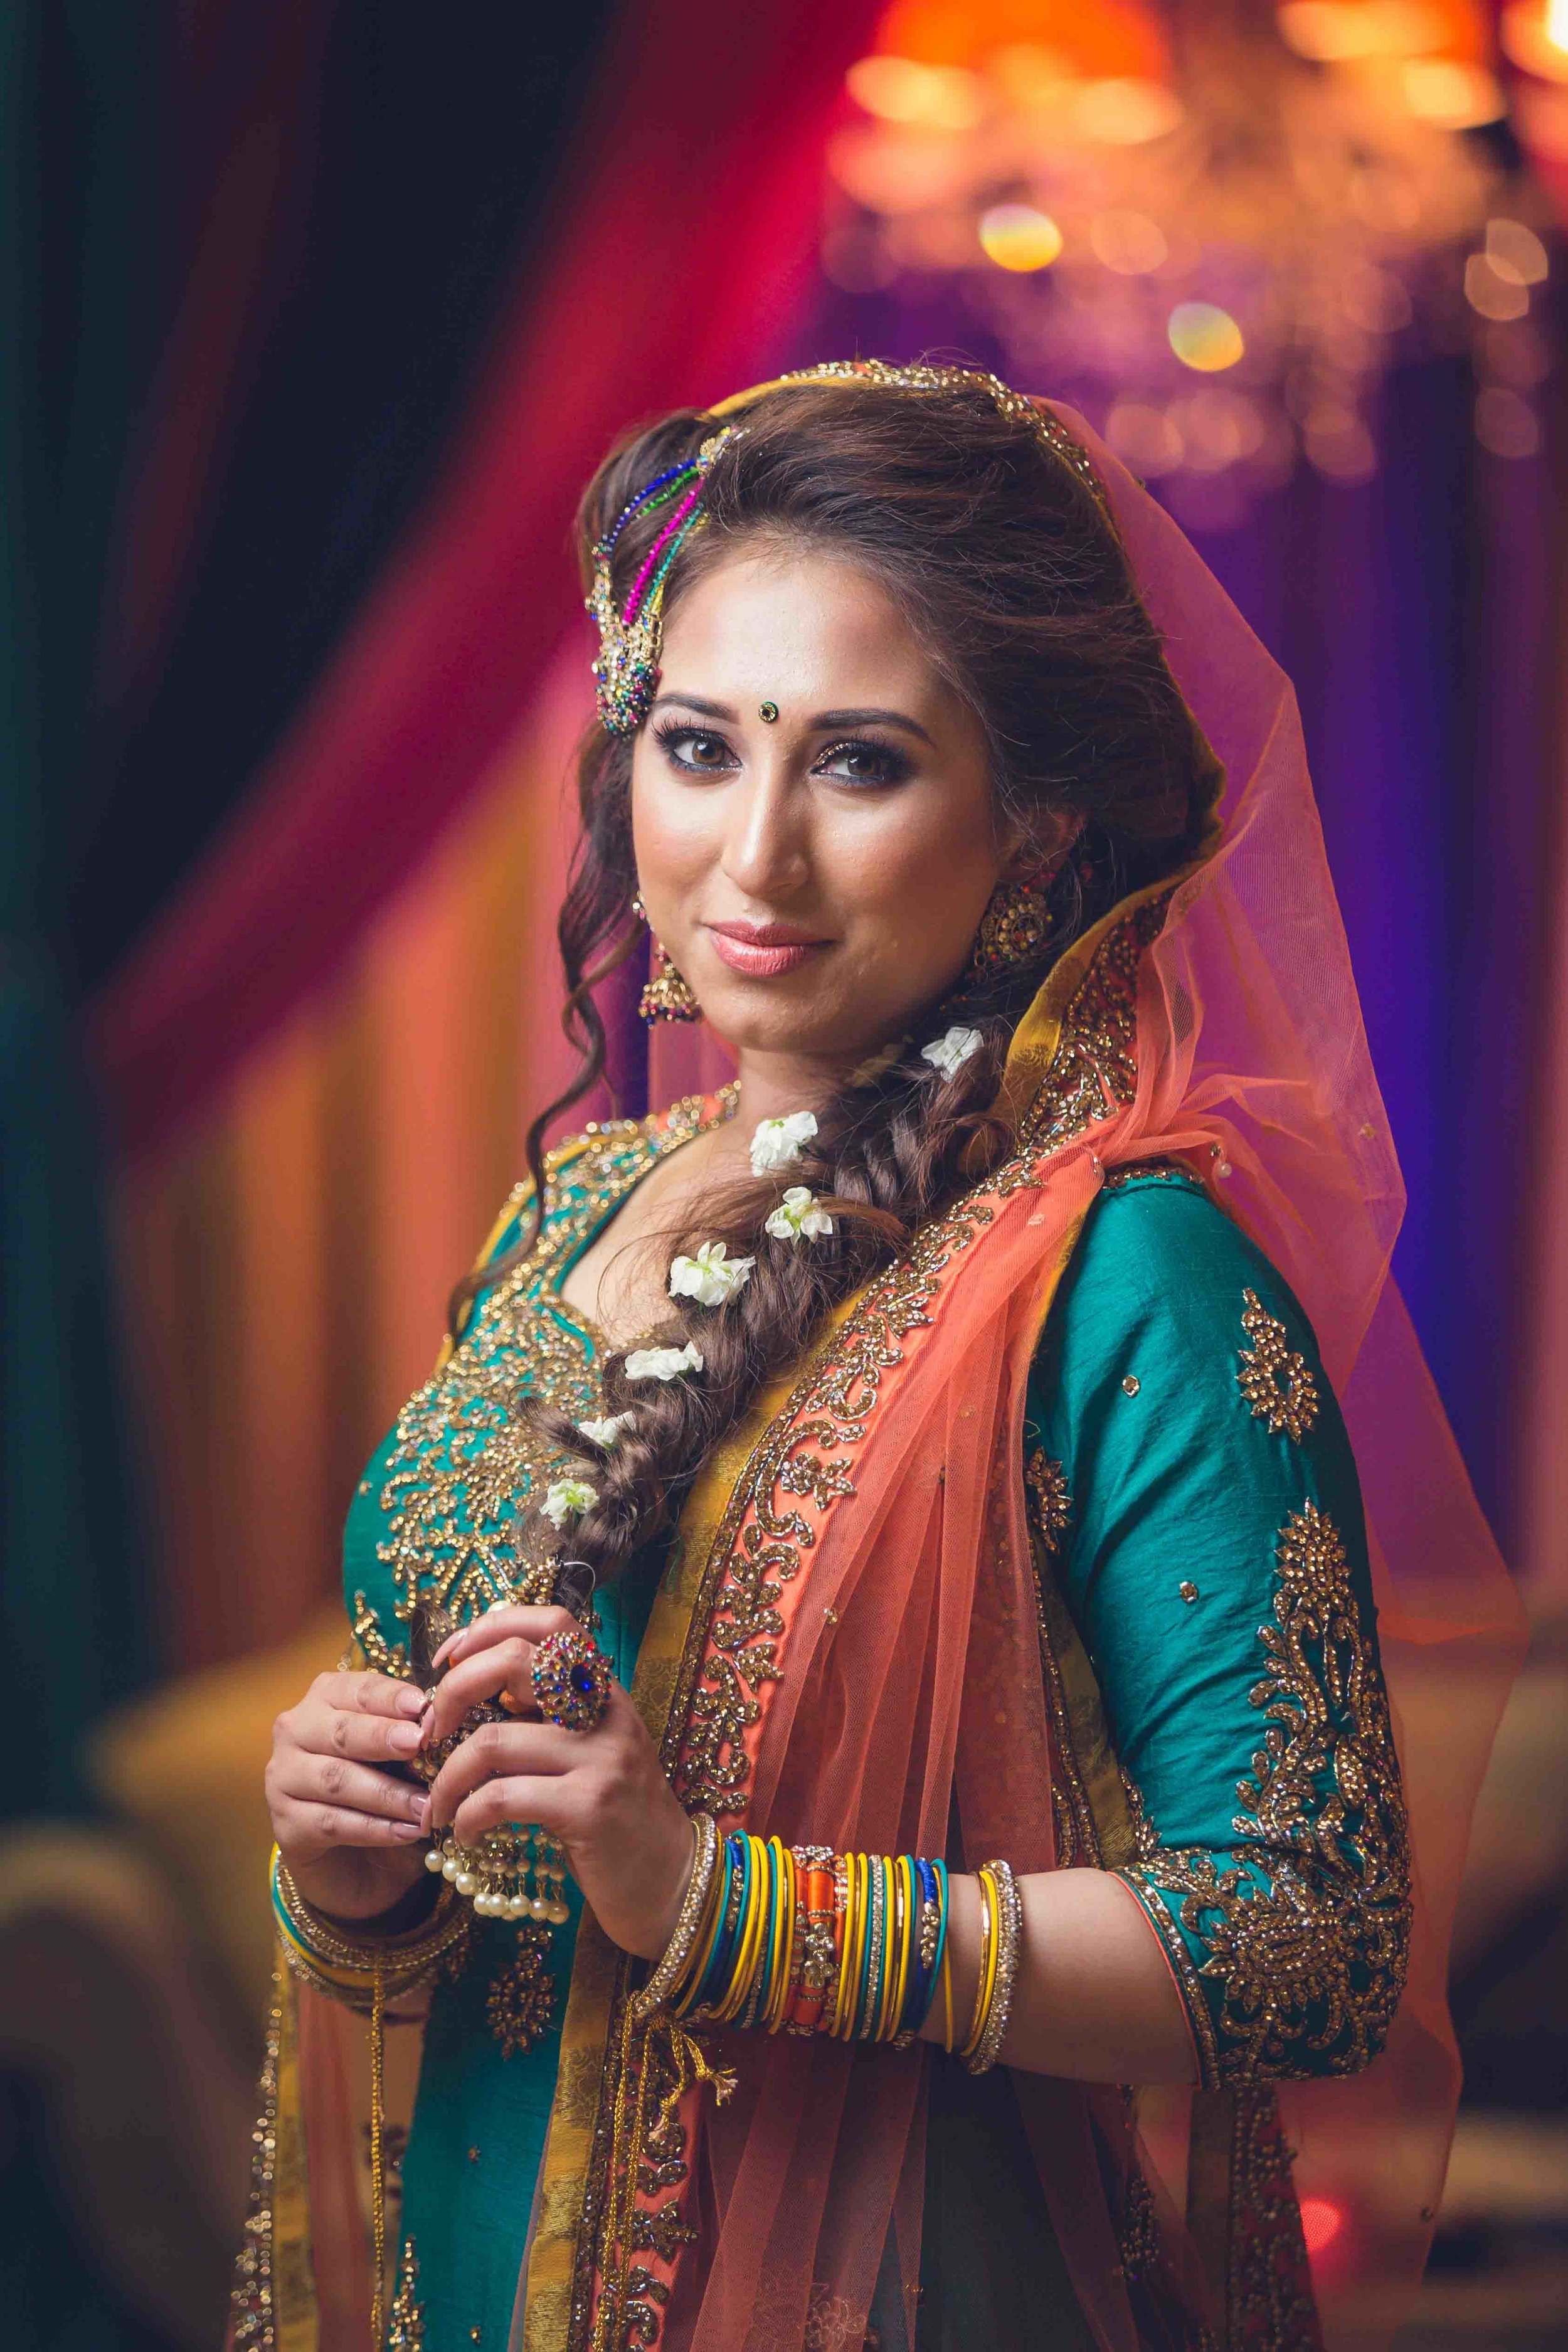 Opu Sultan Photography Asian wedding photography scotland edinburgh glasgow manchester birmingham london-26.jpg